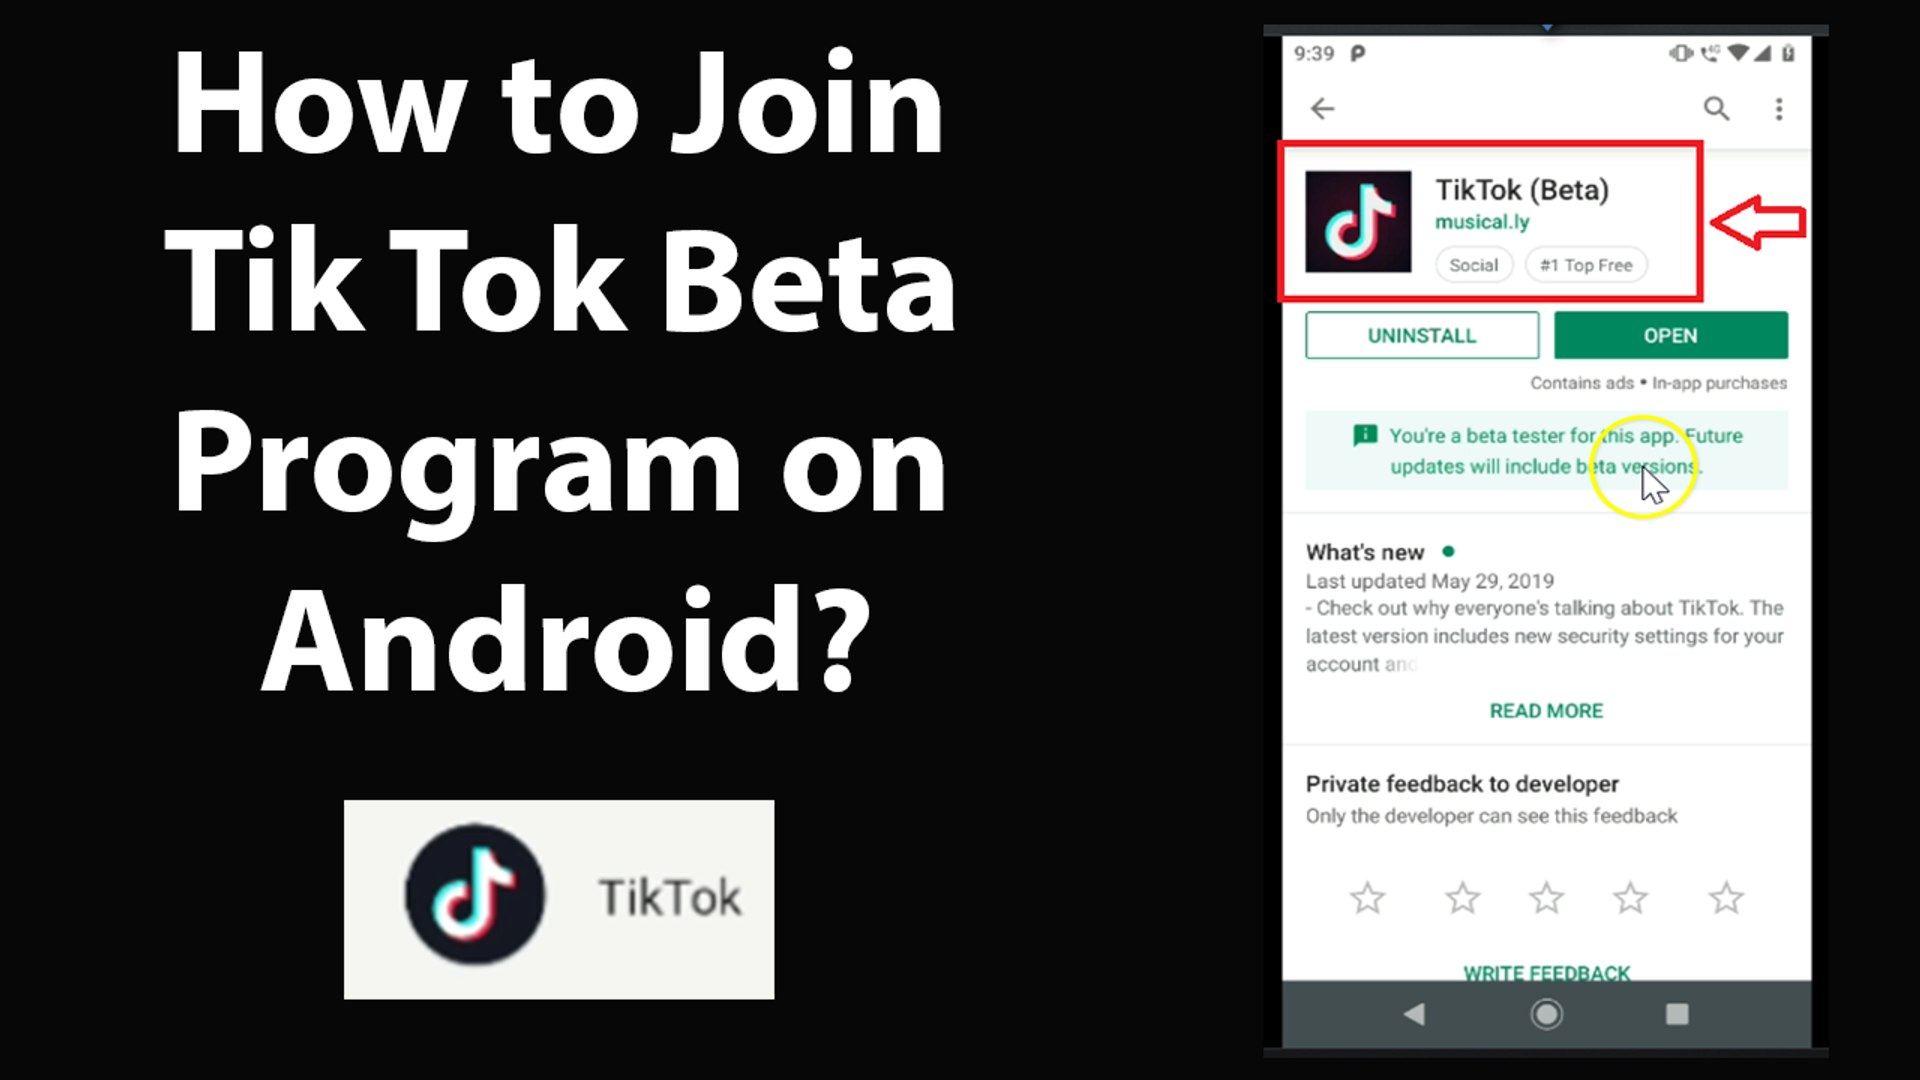 How to Join Tik Tok Beta Program on Android?